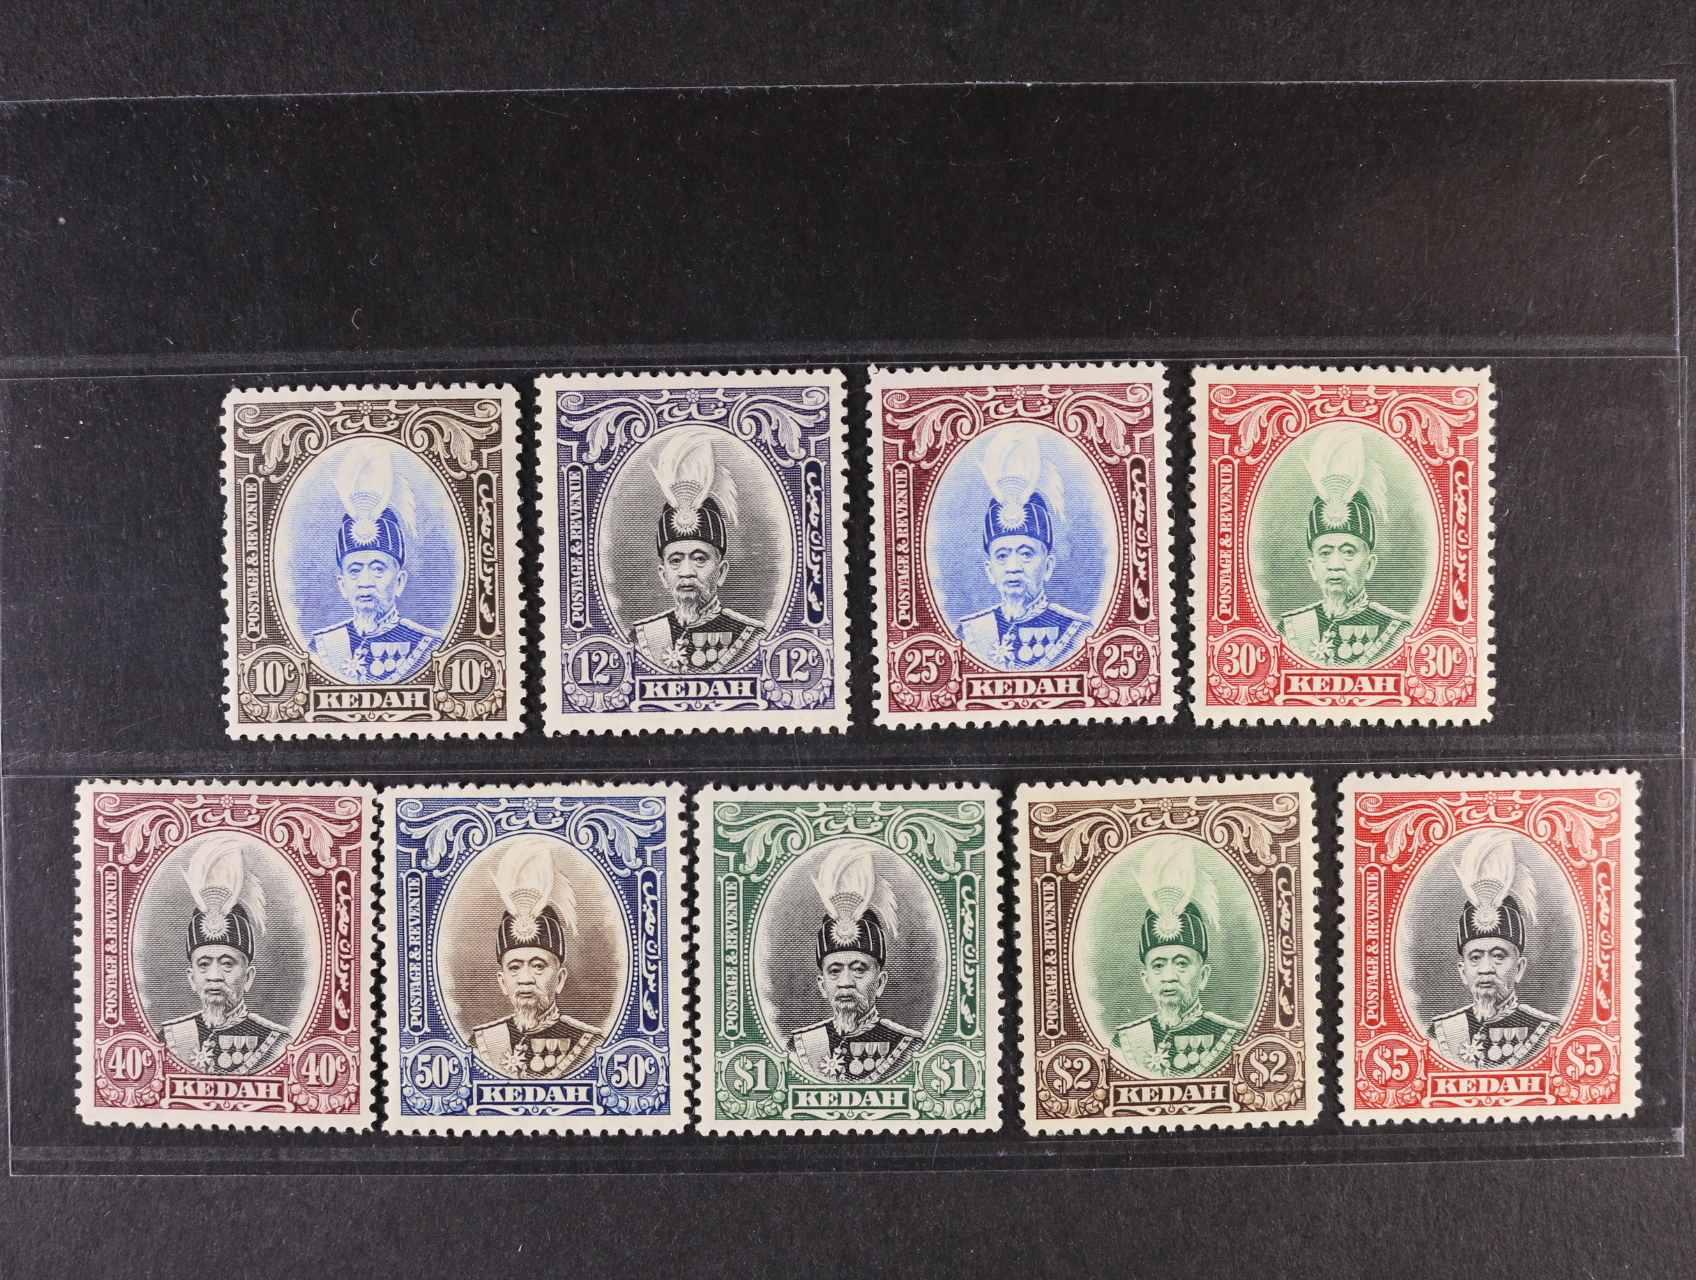 Kedah - zn. SG č. 60 - 68, 275 Liber